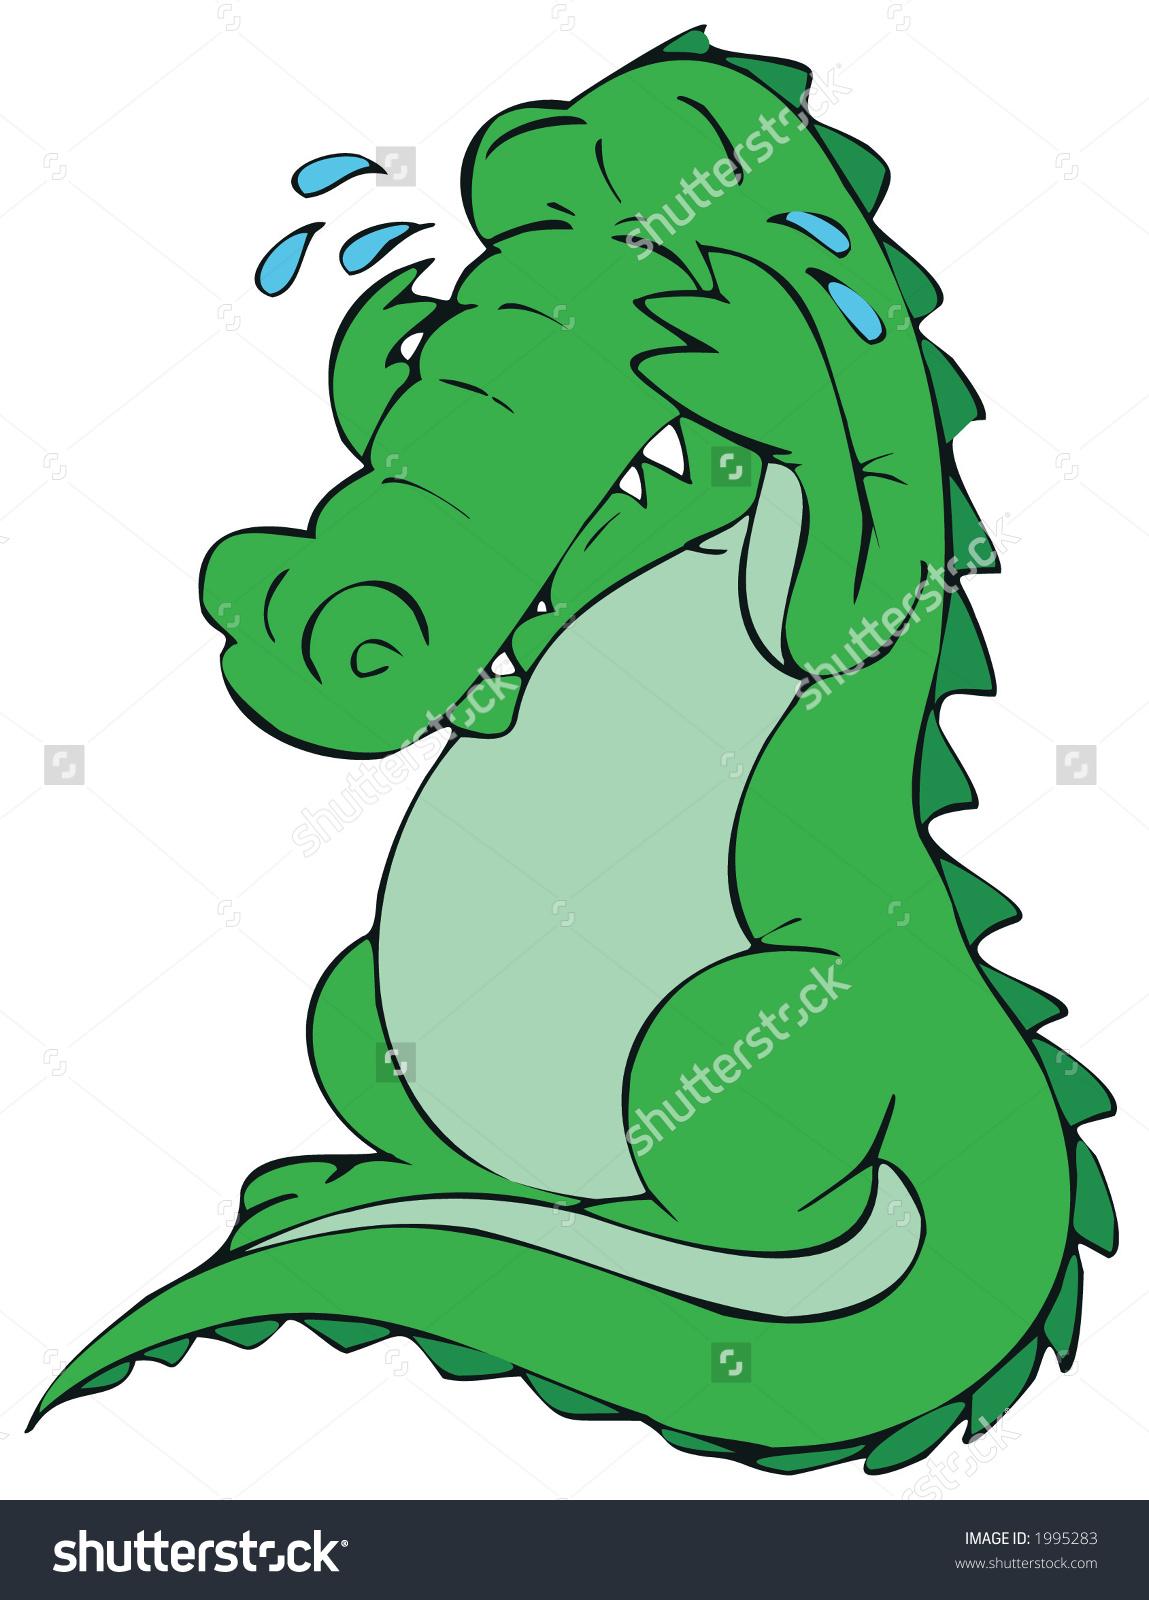 Alligator clipart sad Sadness) (insincere all History: believe